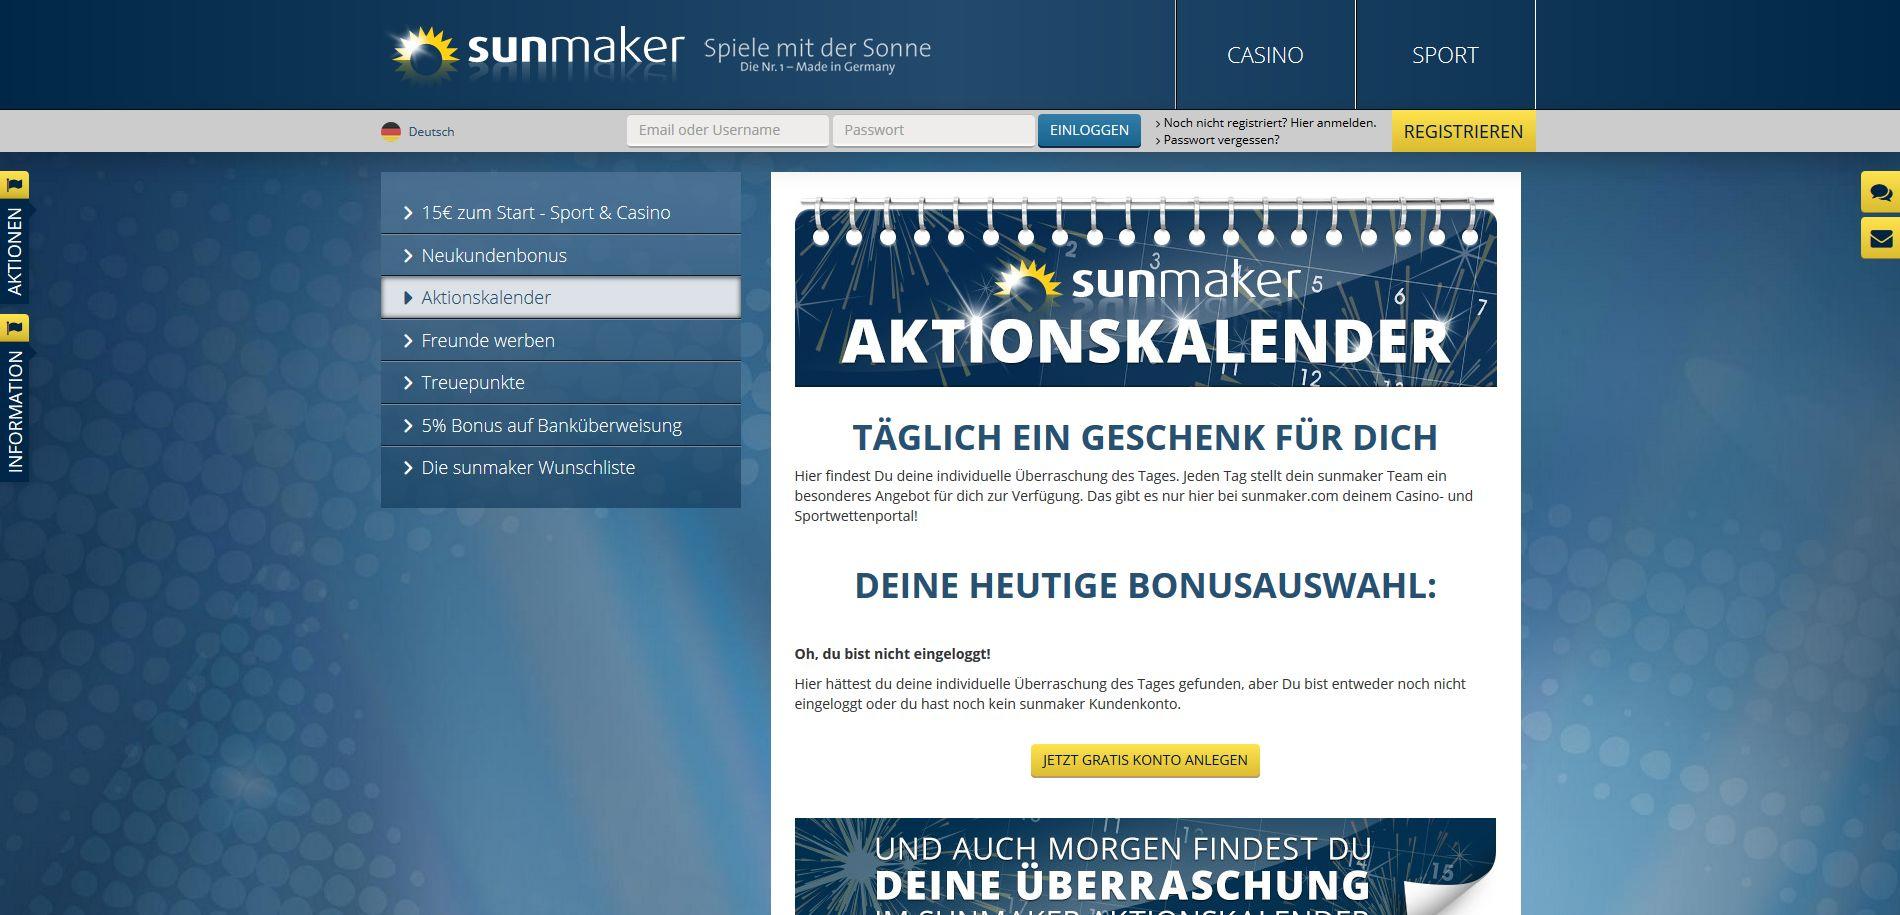 sunmaker-aktionen